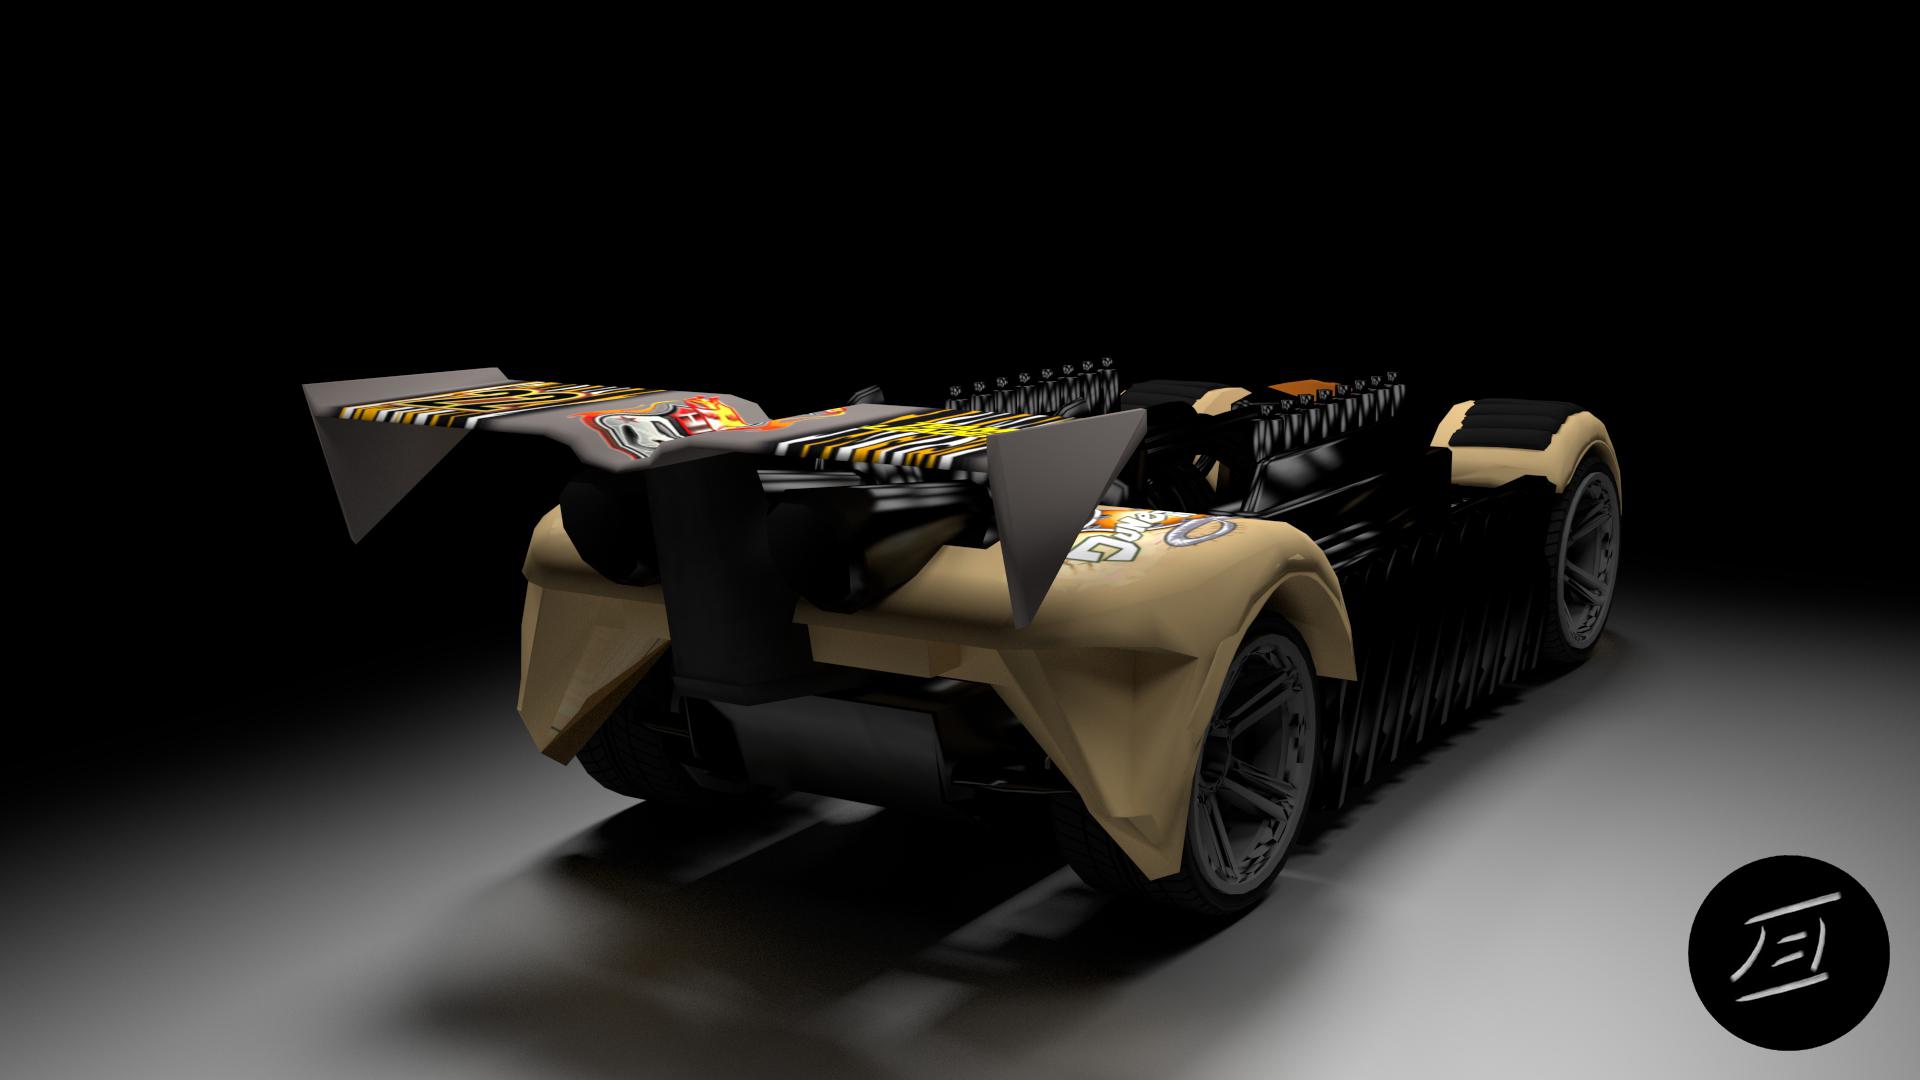 Krazy Car: Krazy 8s Rear By Xceptre On DeviantArt